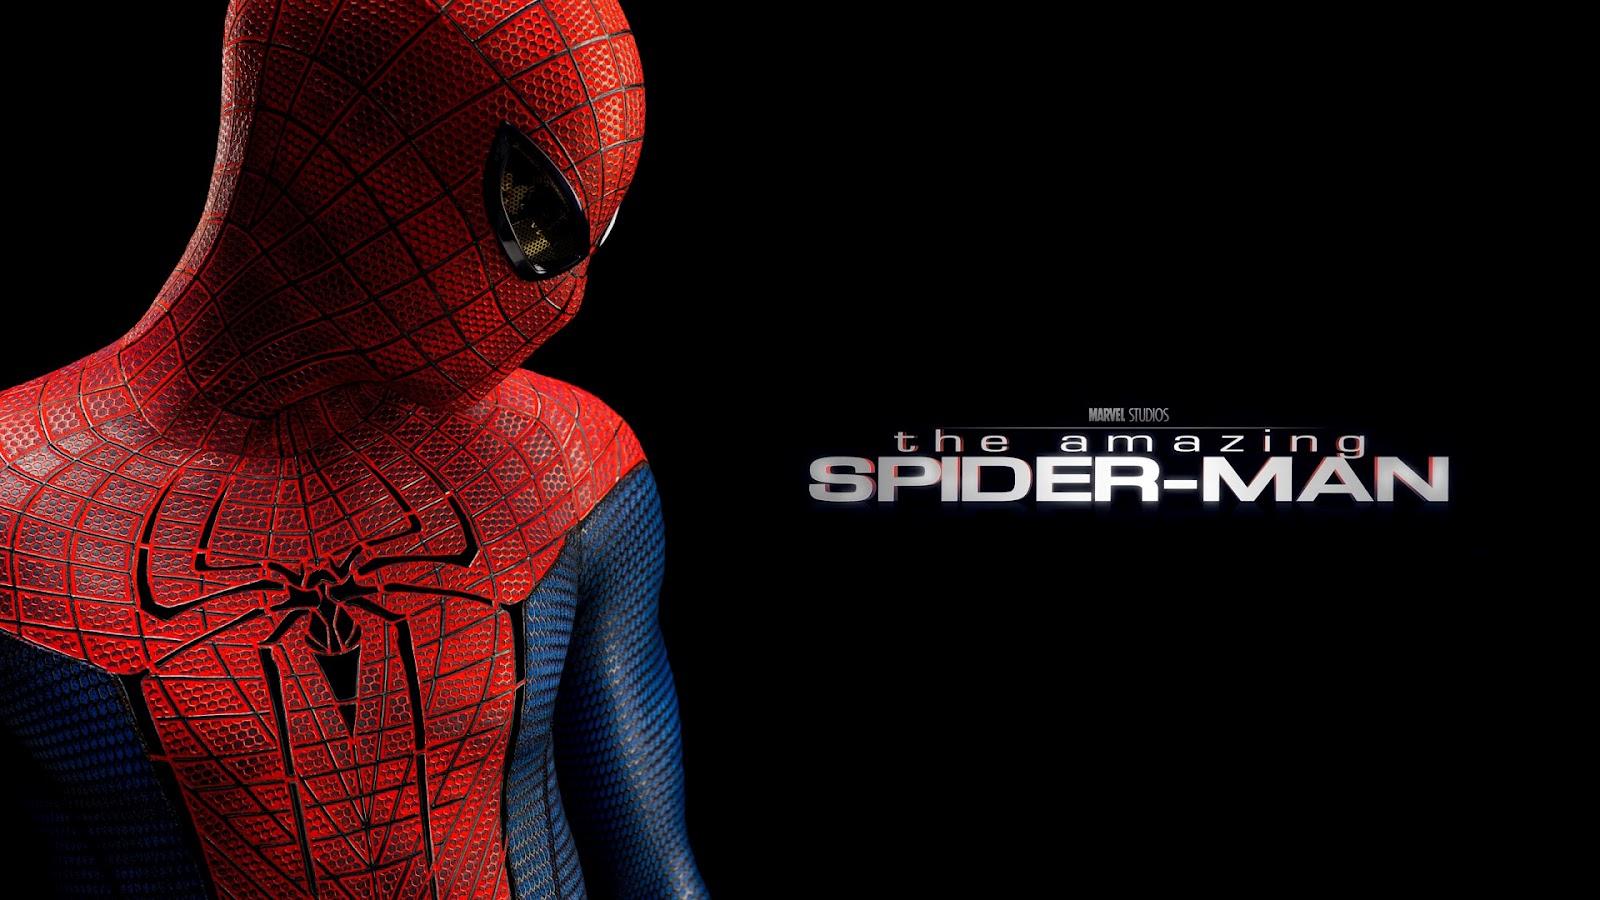 The Amazing Spiderman Wallpaper